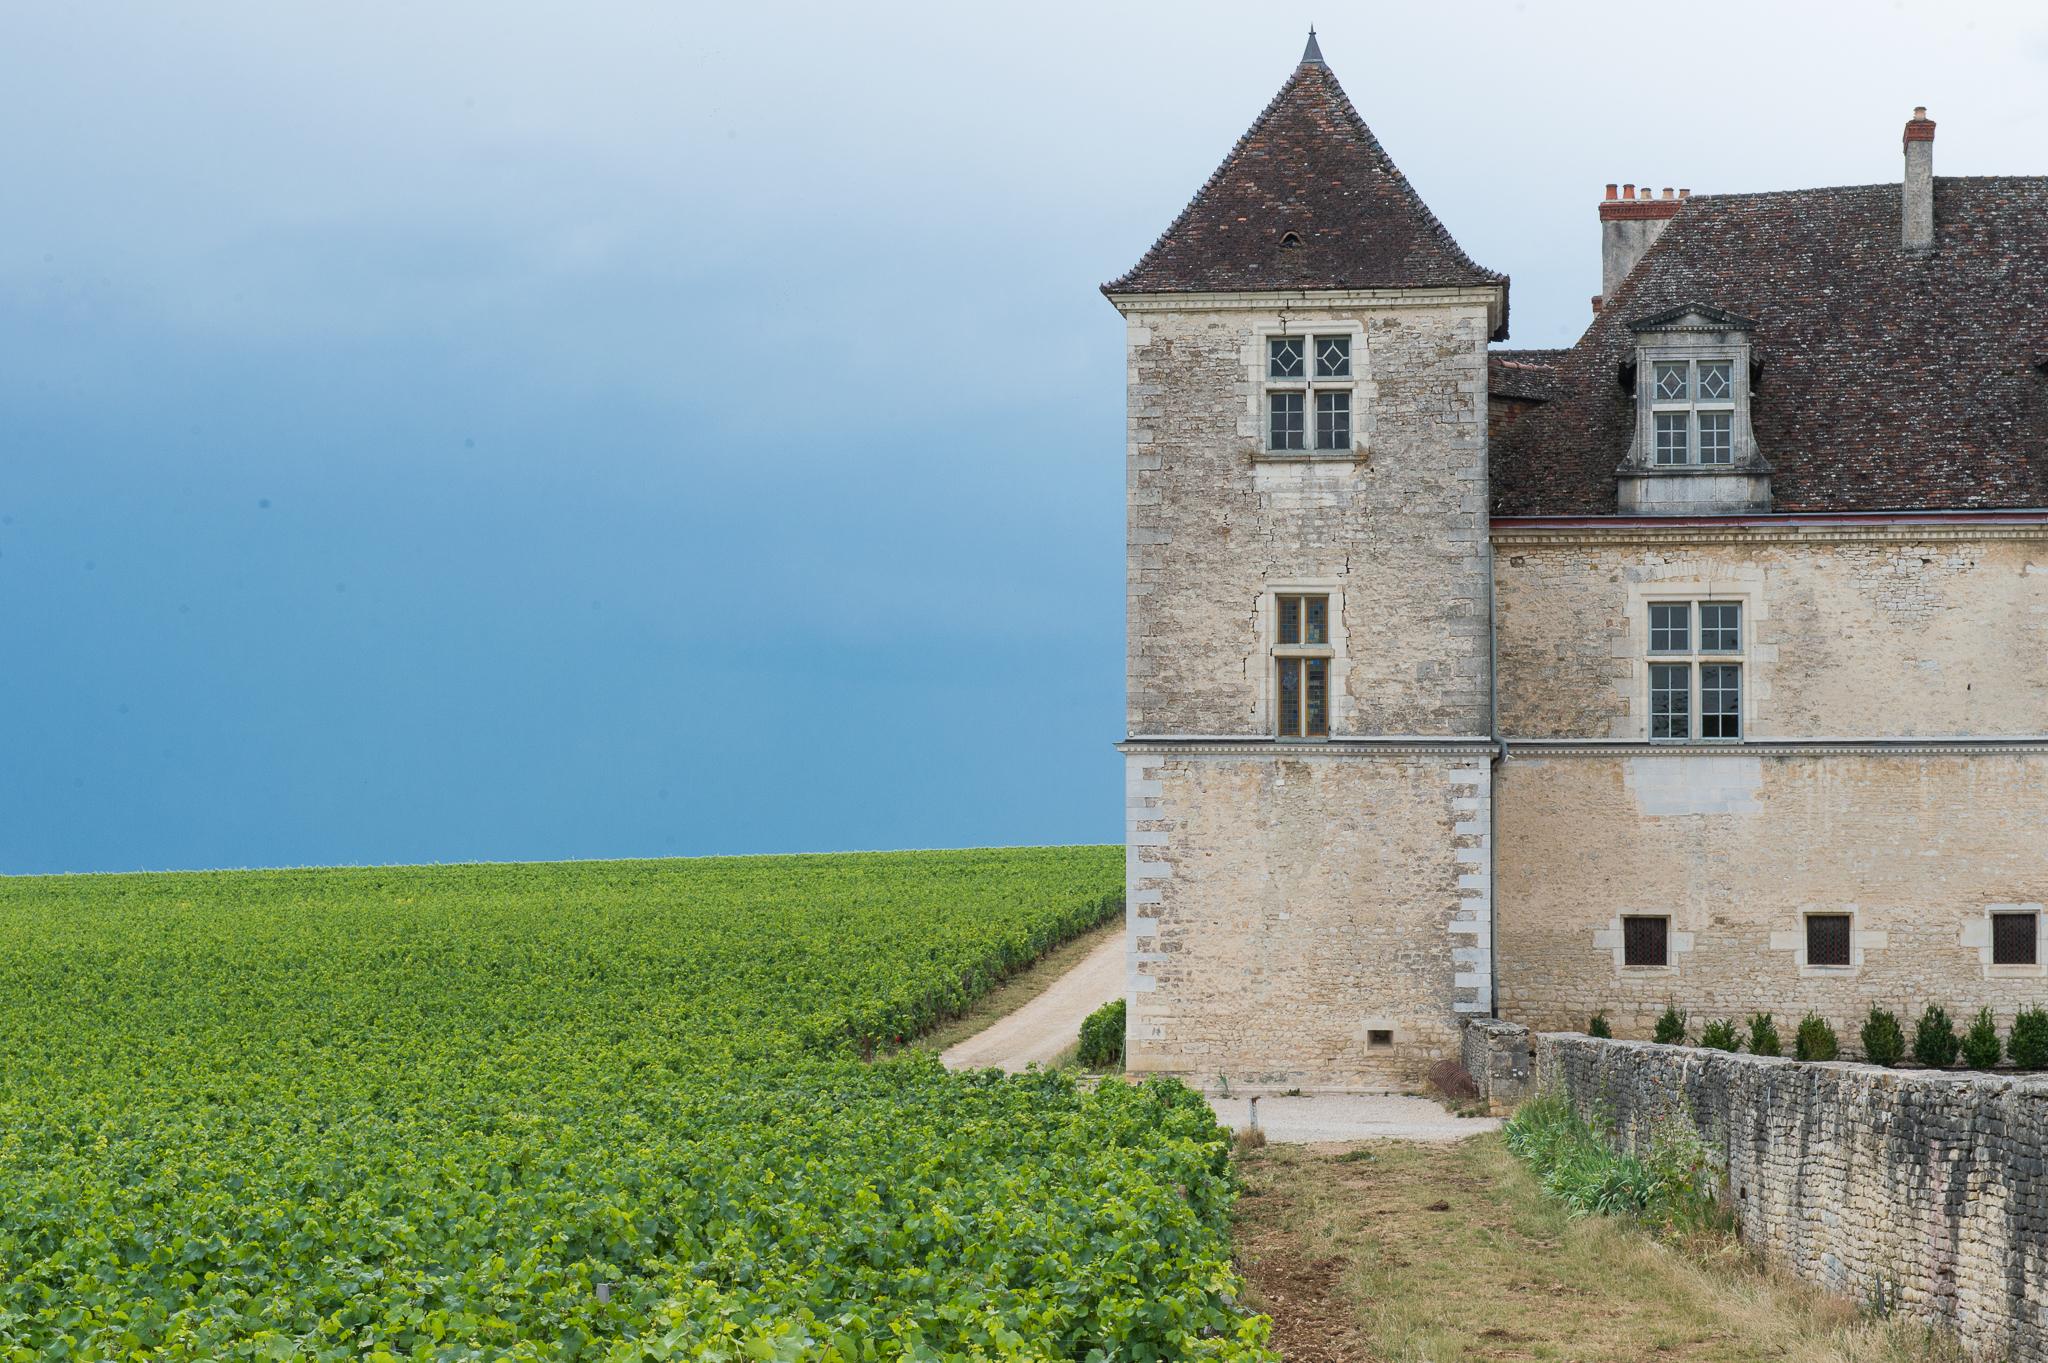 Jason-Davis-Images-Burgundy-0006.jpg